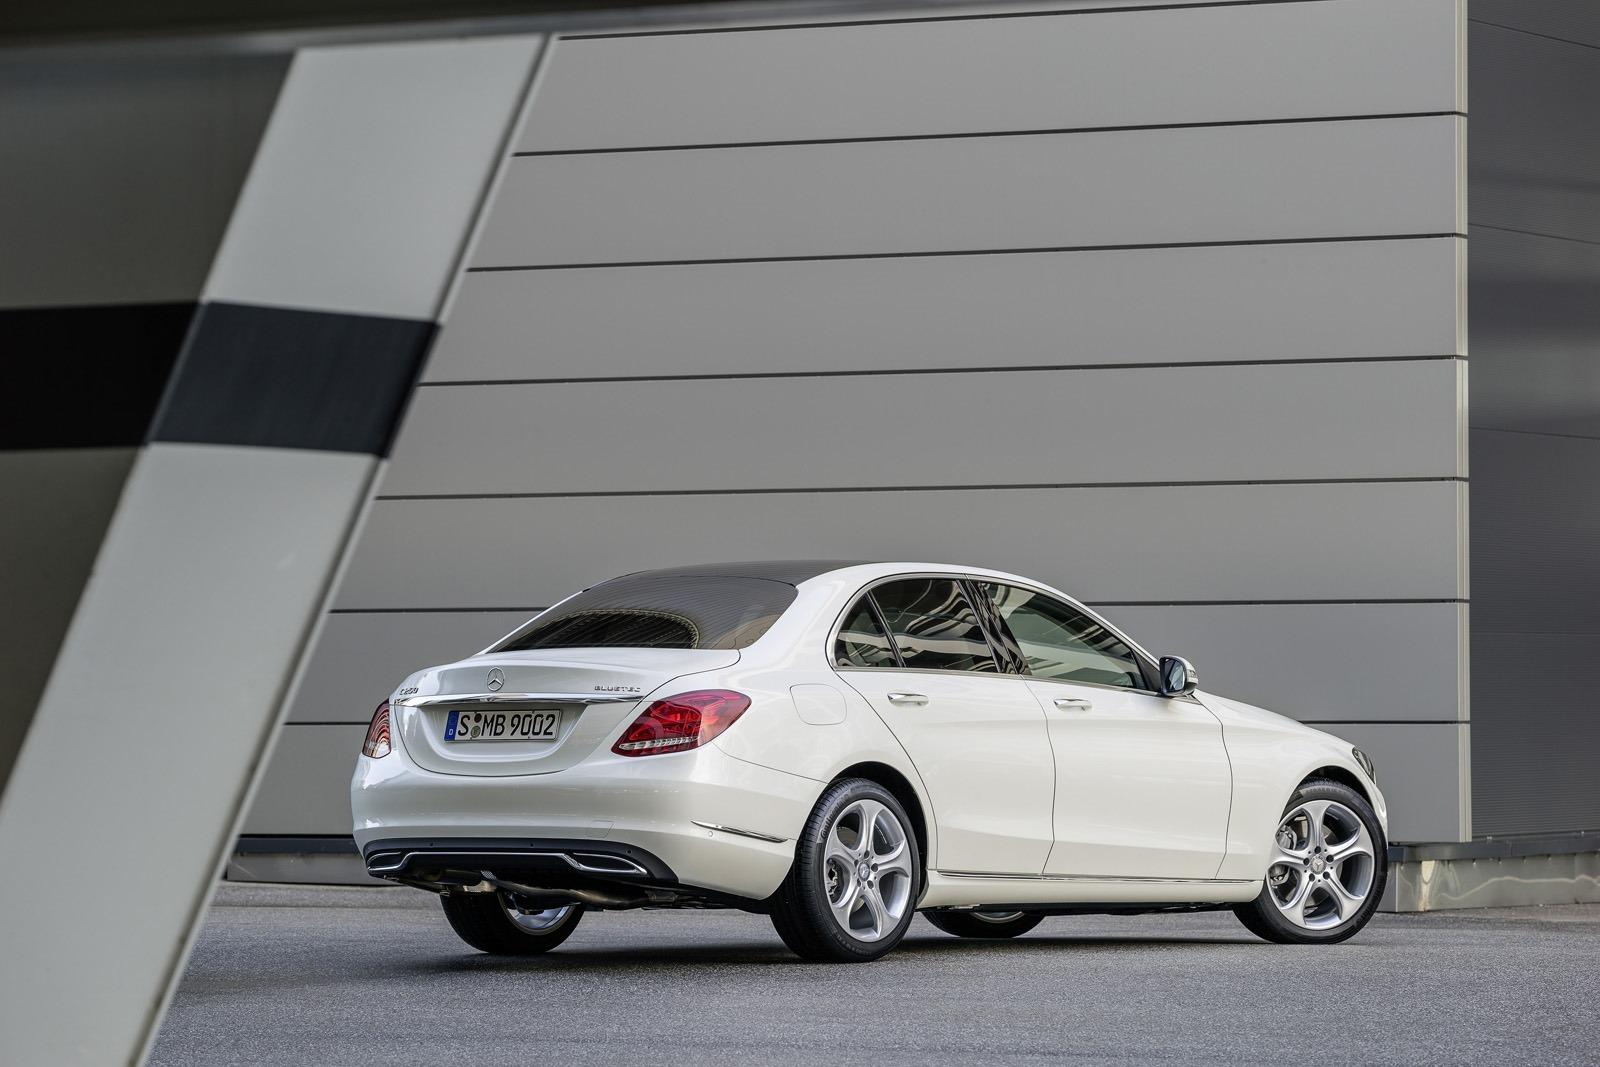 Mercedes-Benz Classe C 2014 - Mercedes-Benz - Autopareri